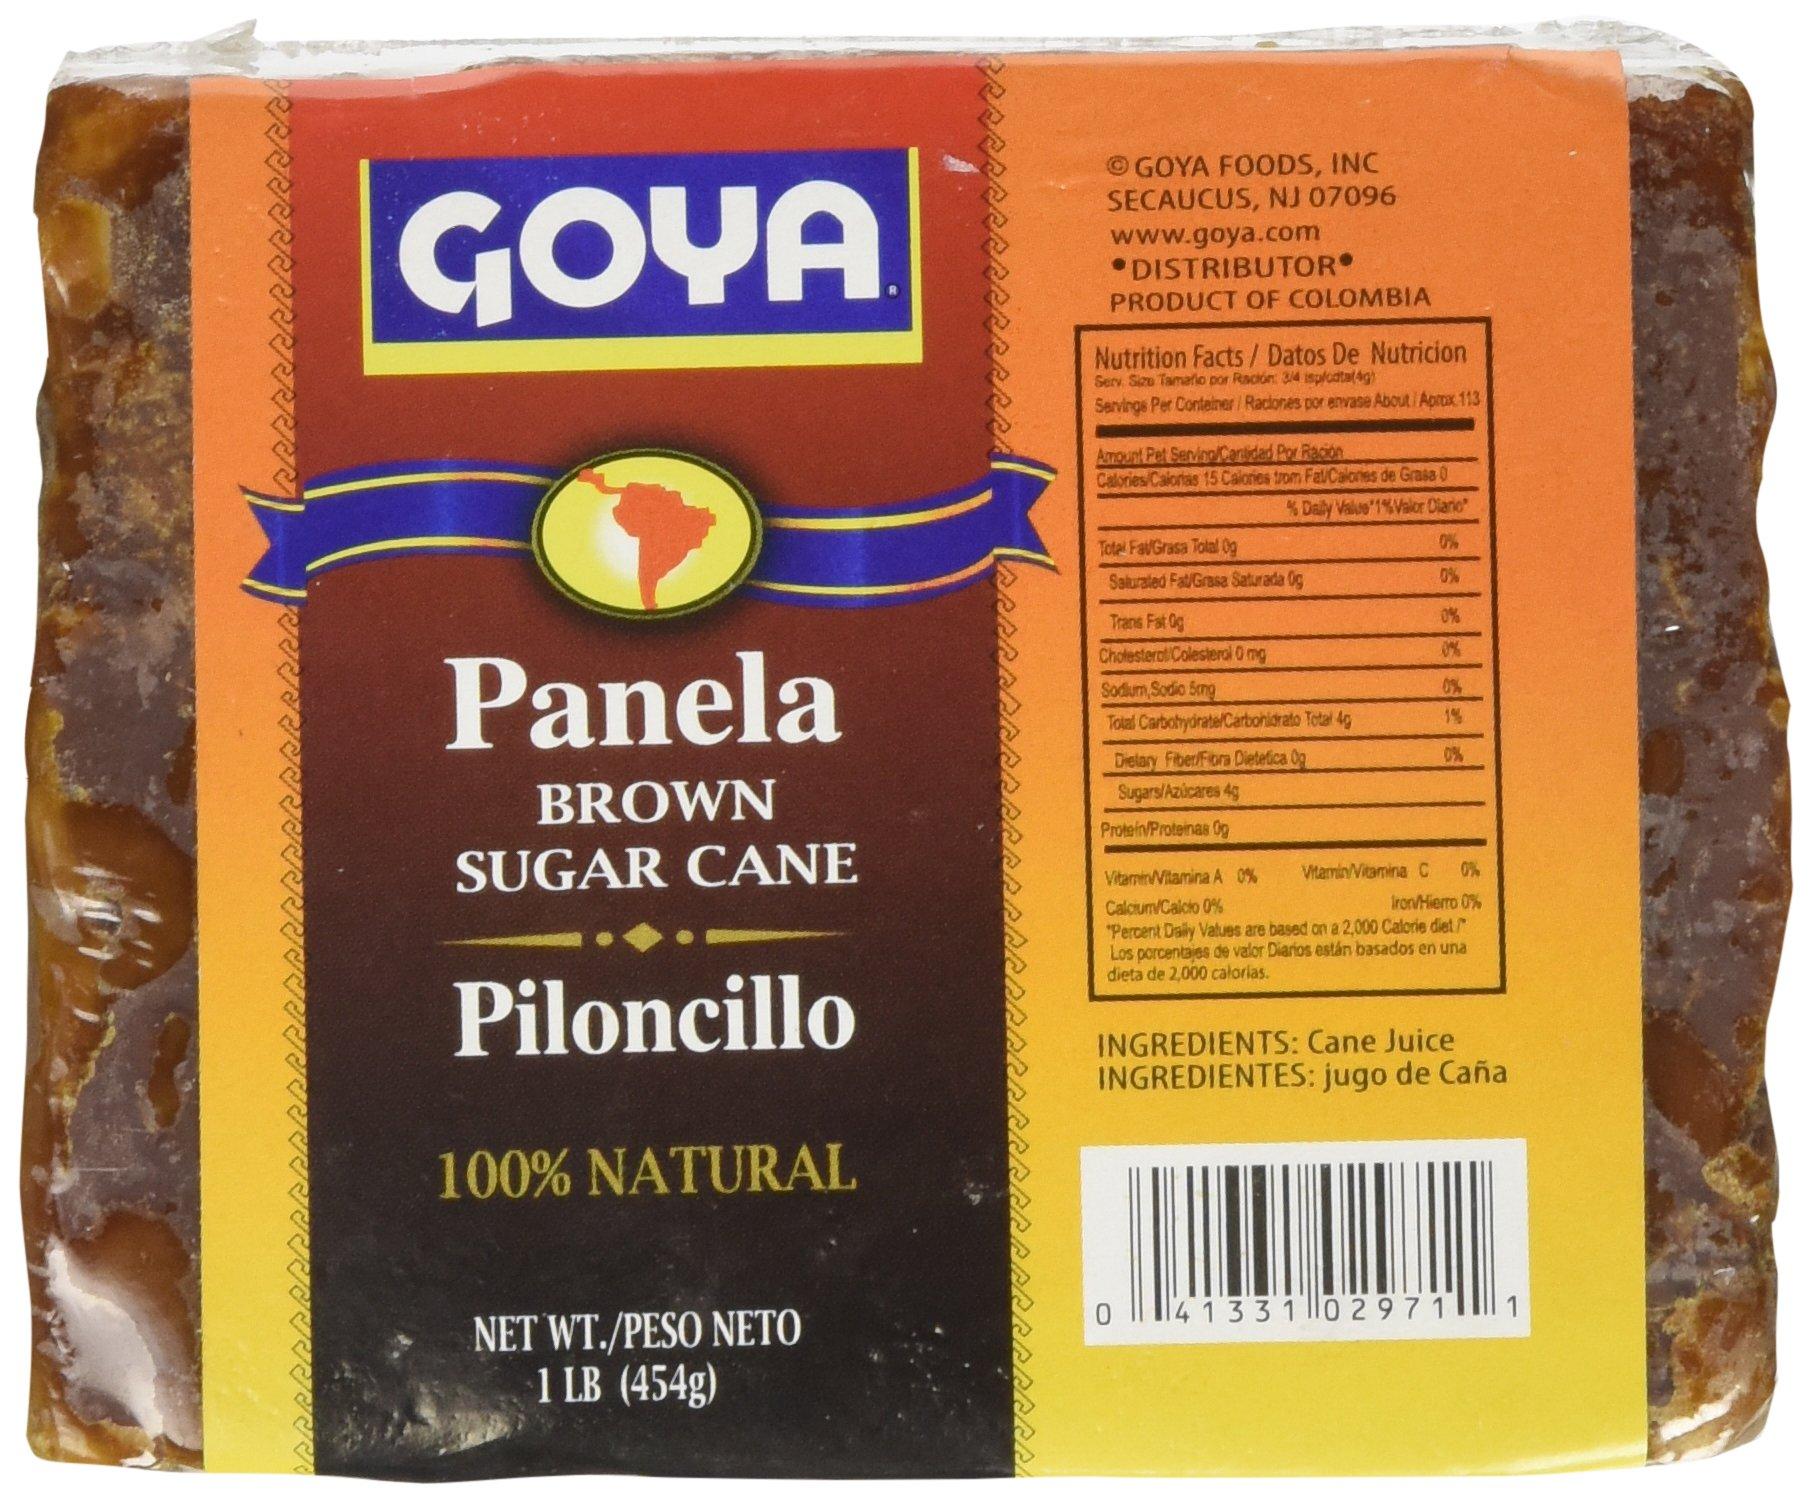 Goya Panela Brown Sugar Cane - Piloncillo